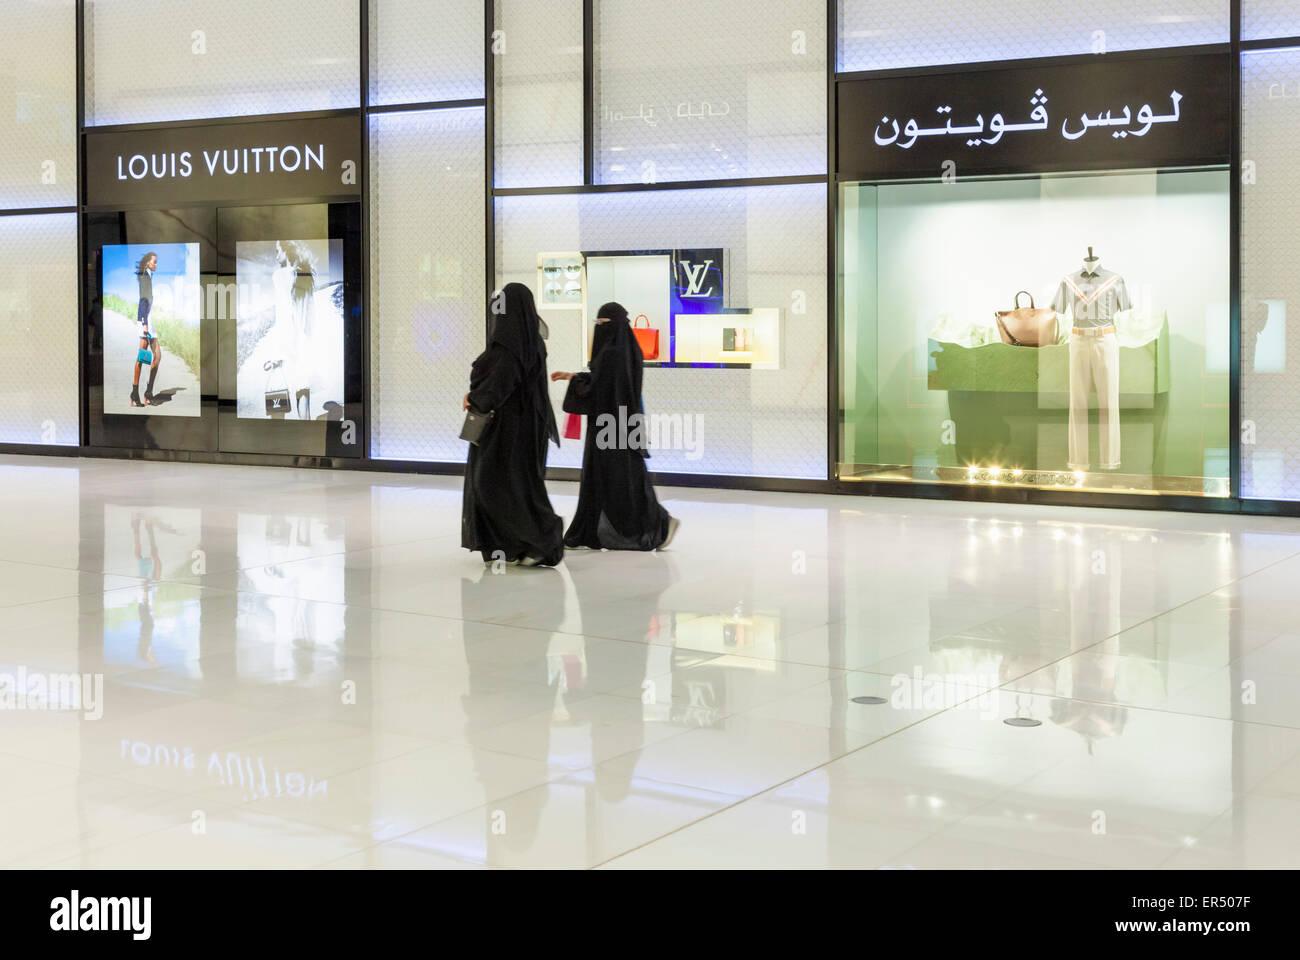 louis vuitton store outside. arab shoppers outside louis vuitton store dubai mall city, united emirates, uae, middle east